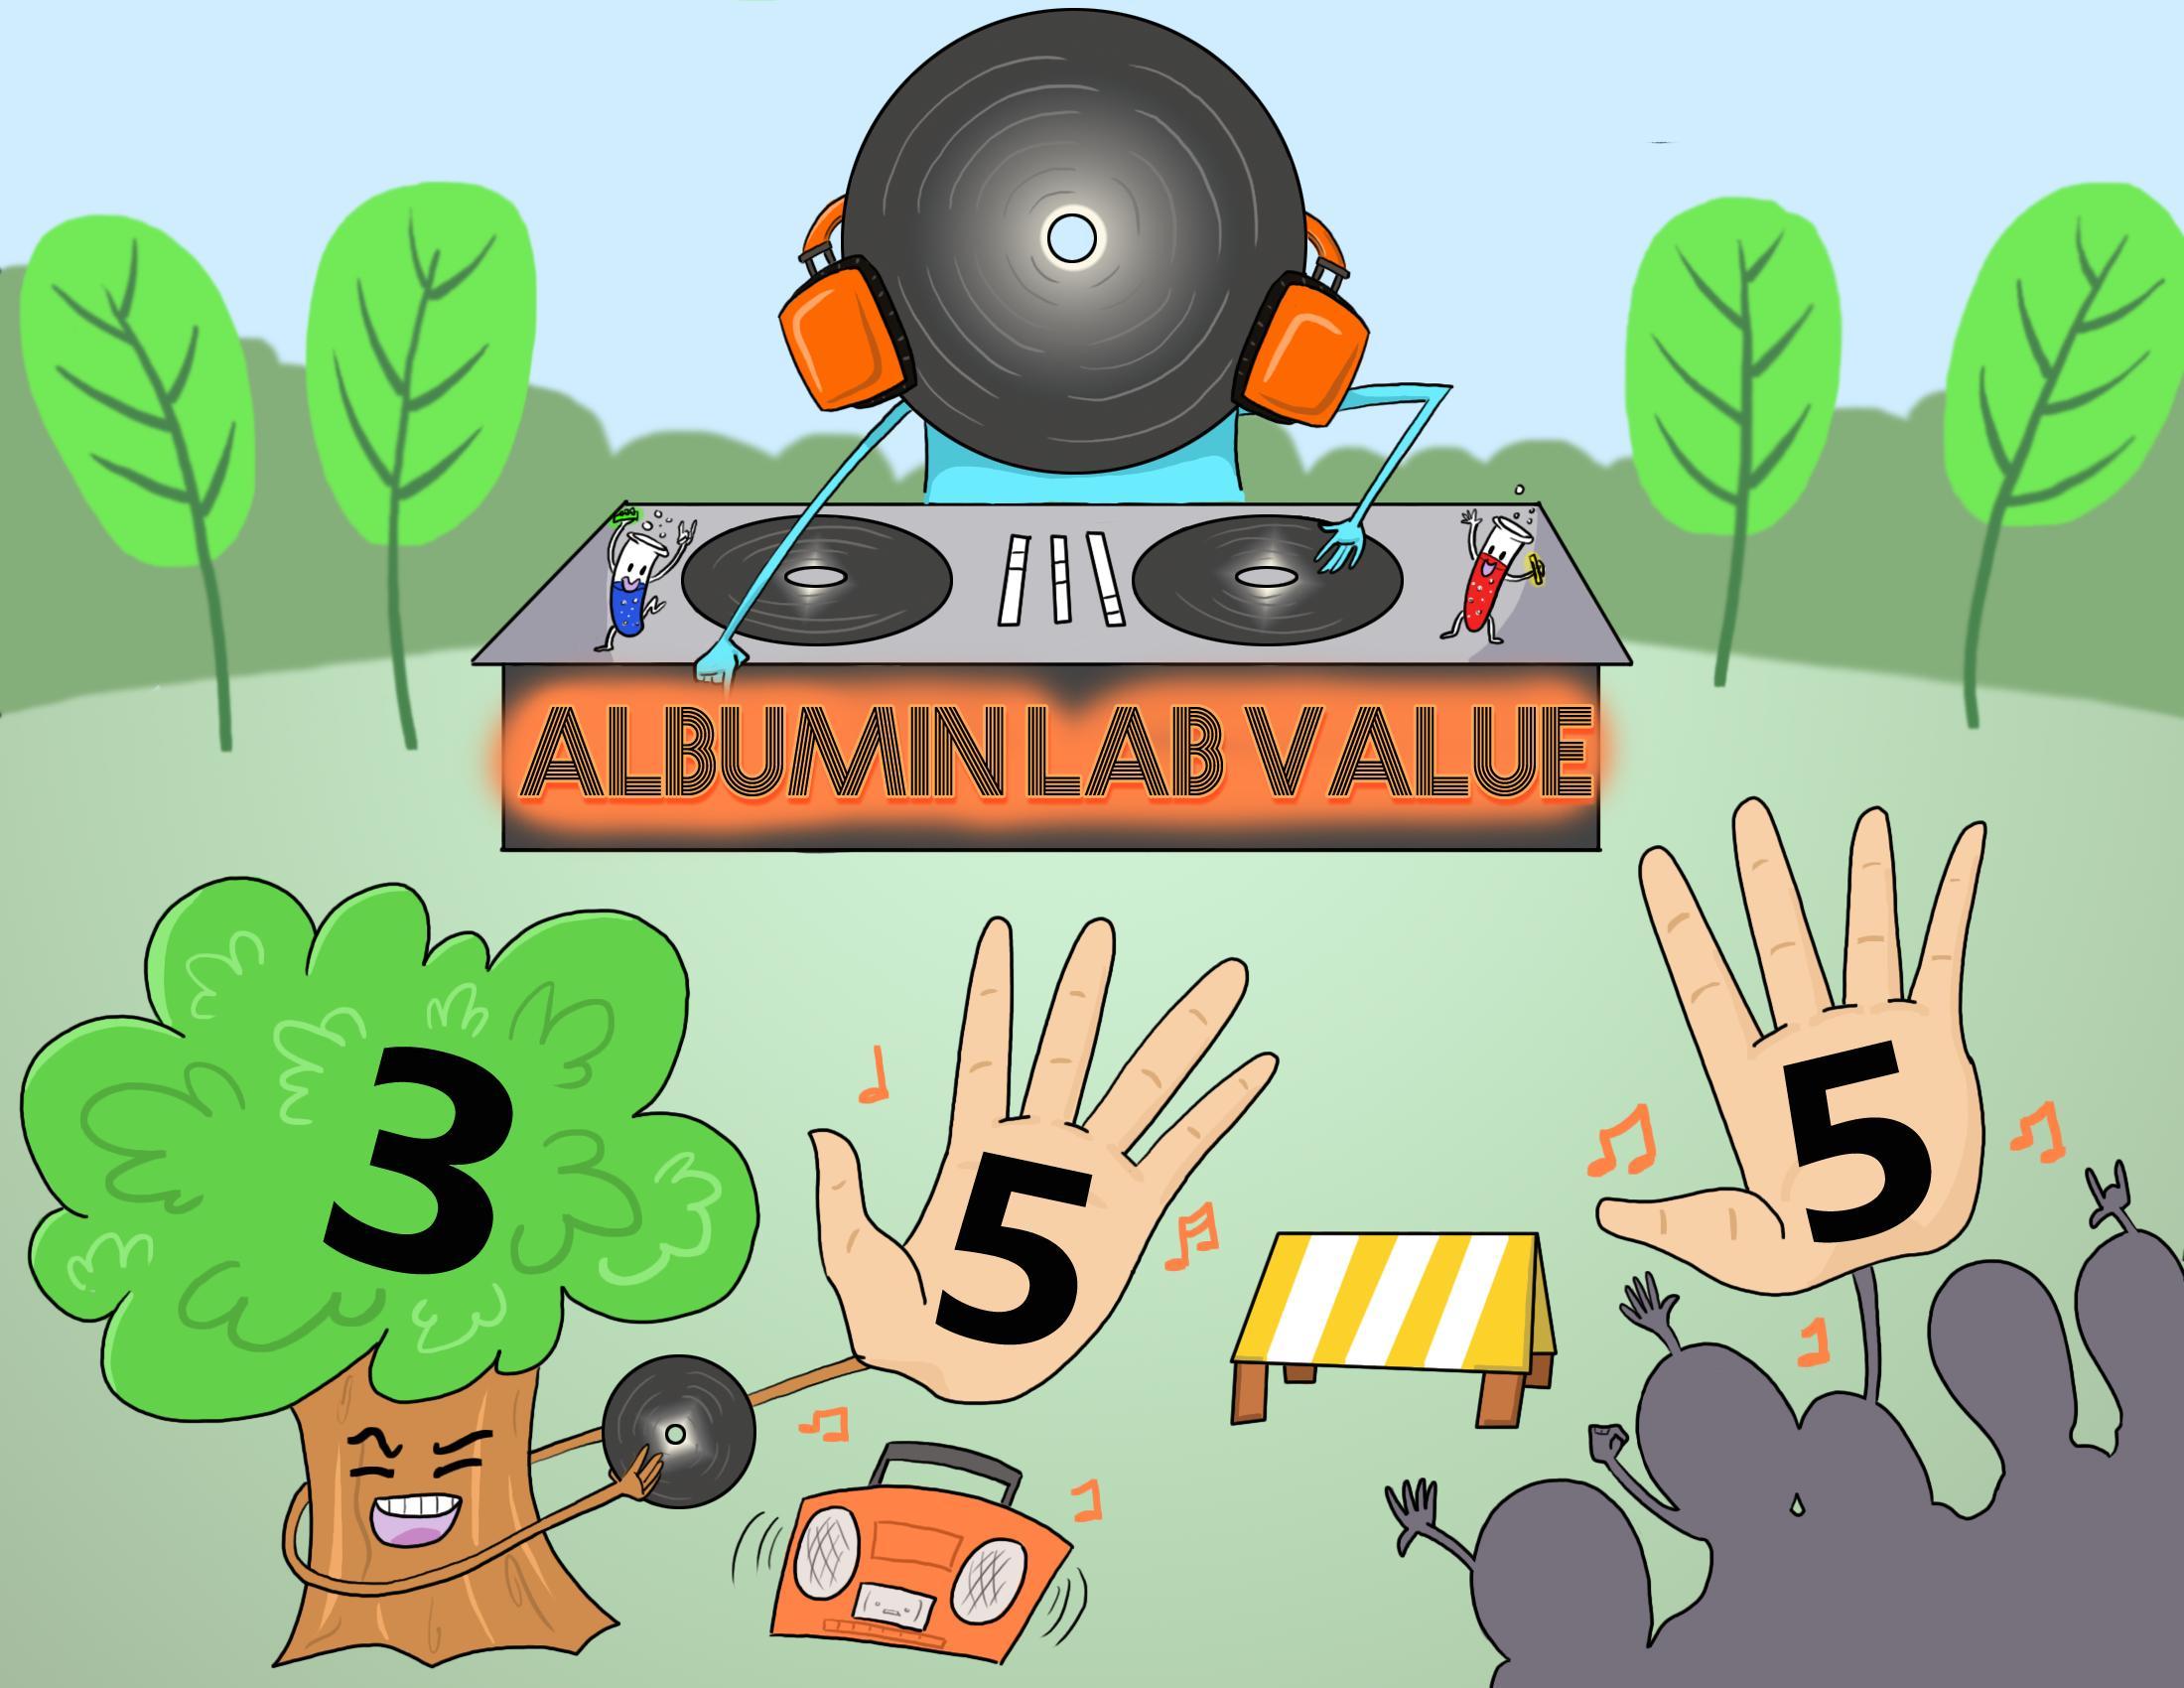 Albumin Lab Value